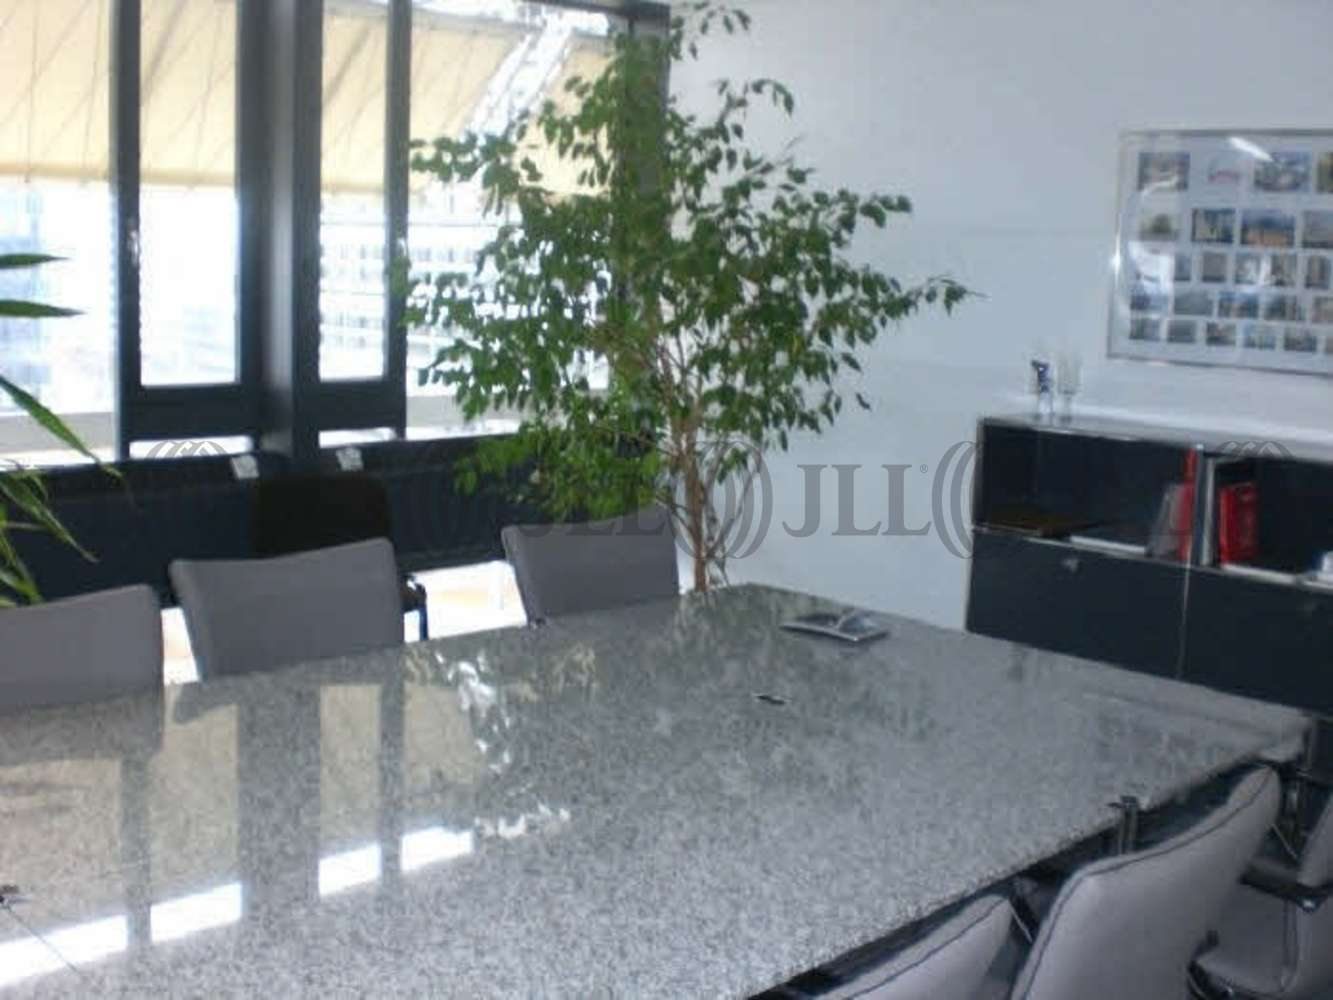 Büros Frankfurt am main, 60528 - Büro - Frankfurt am Main, Schwanheim - F1407 - 9388482